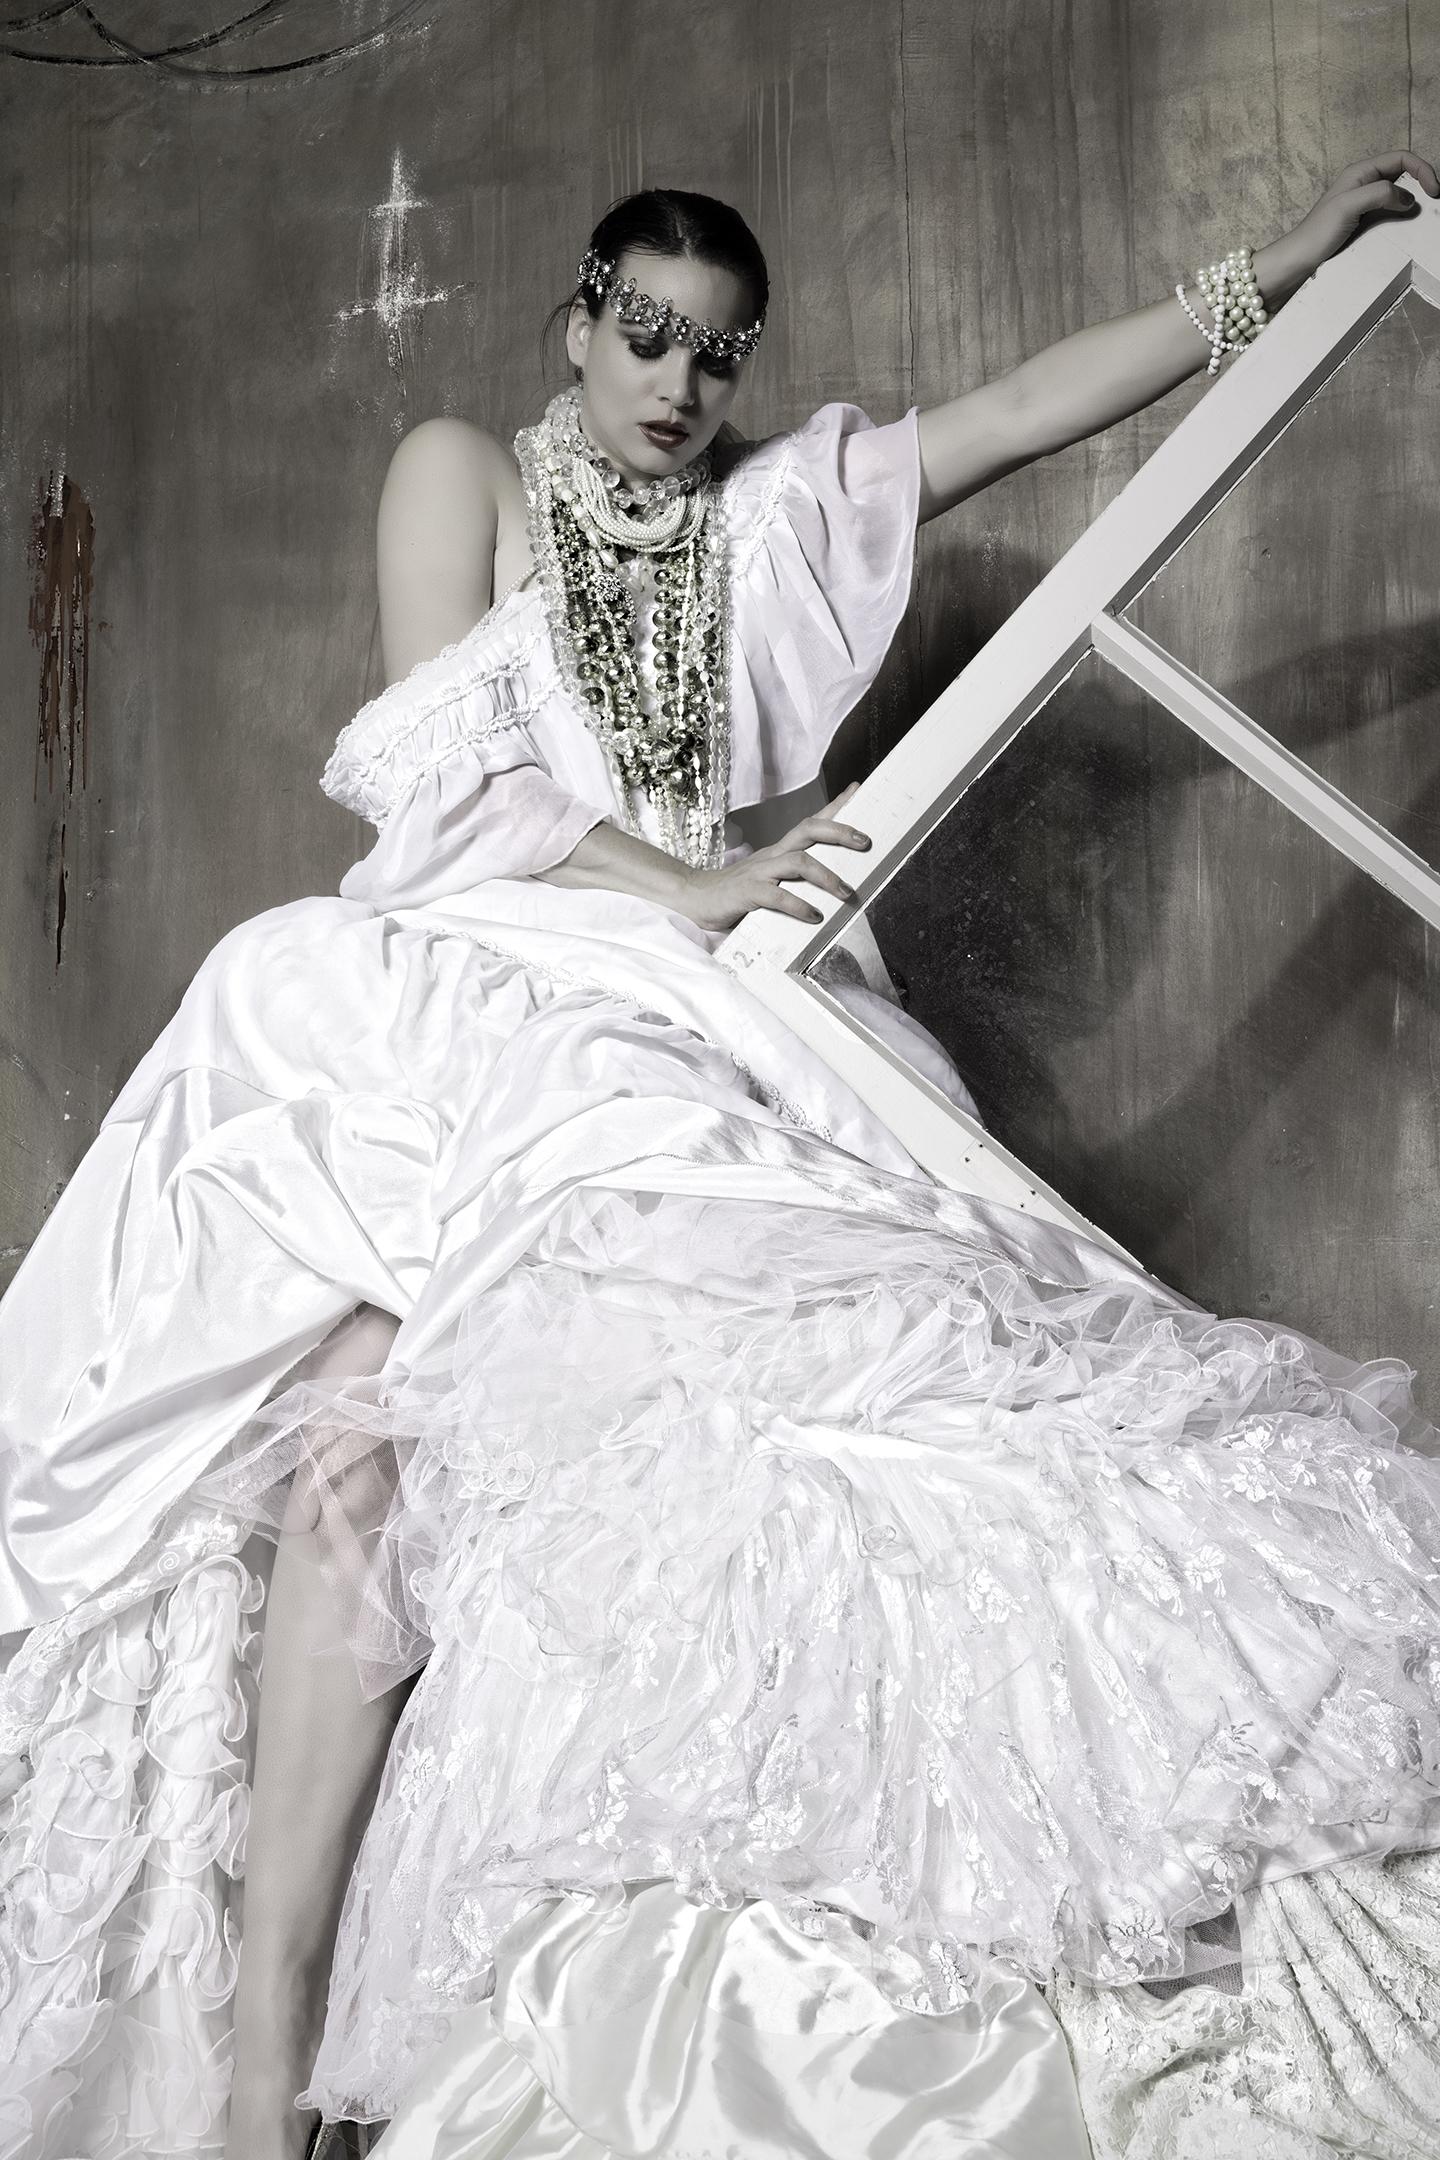 Fashion-fotografie-arnhem-wicipix6